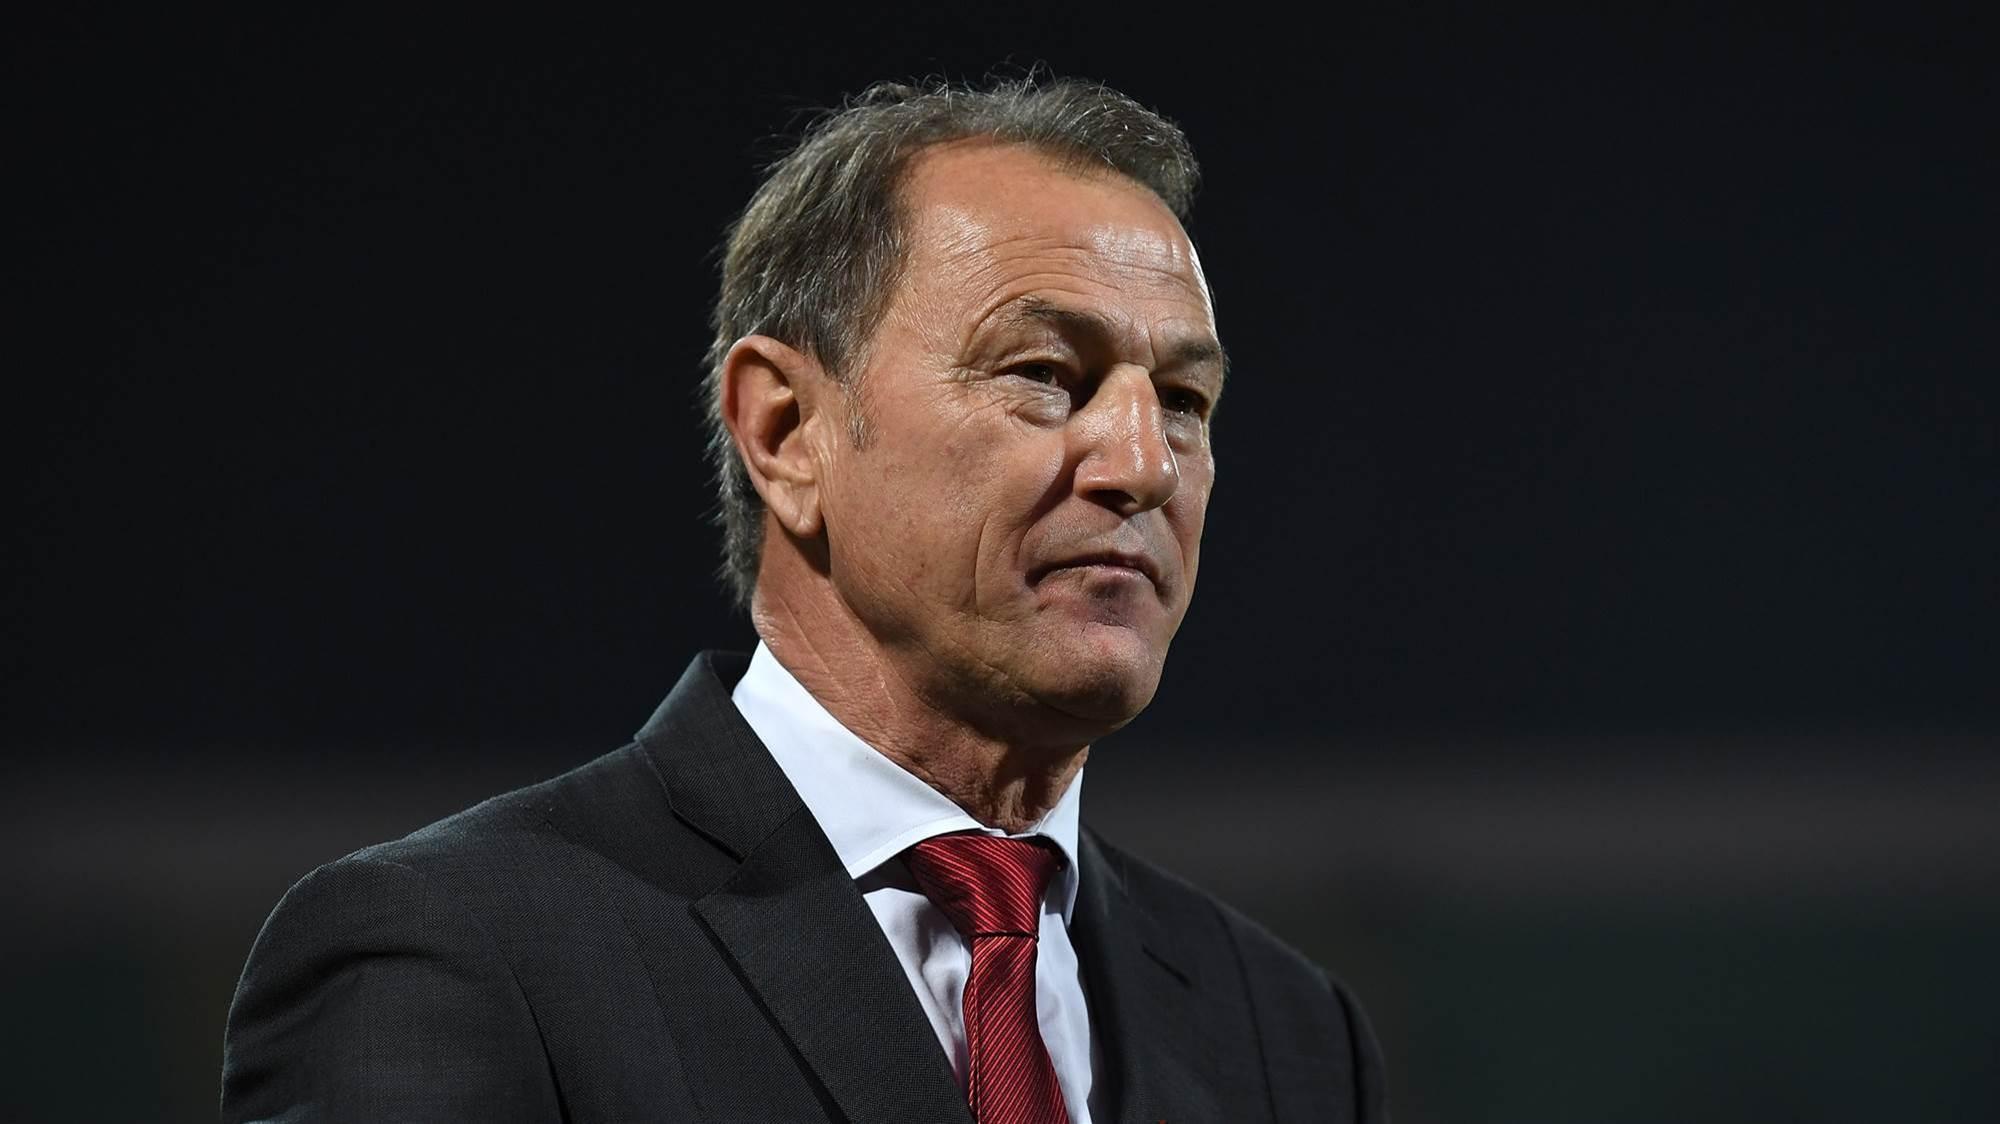 De Biasi confirms FFA approach for Socceroos job